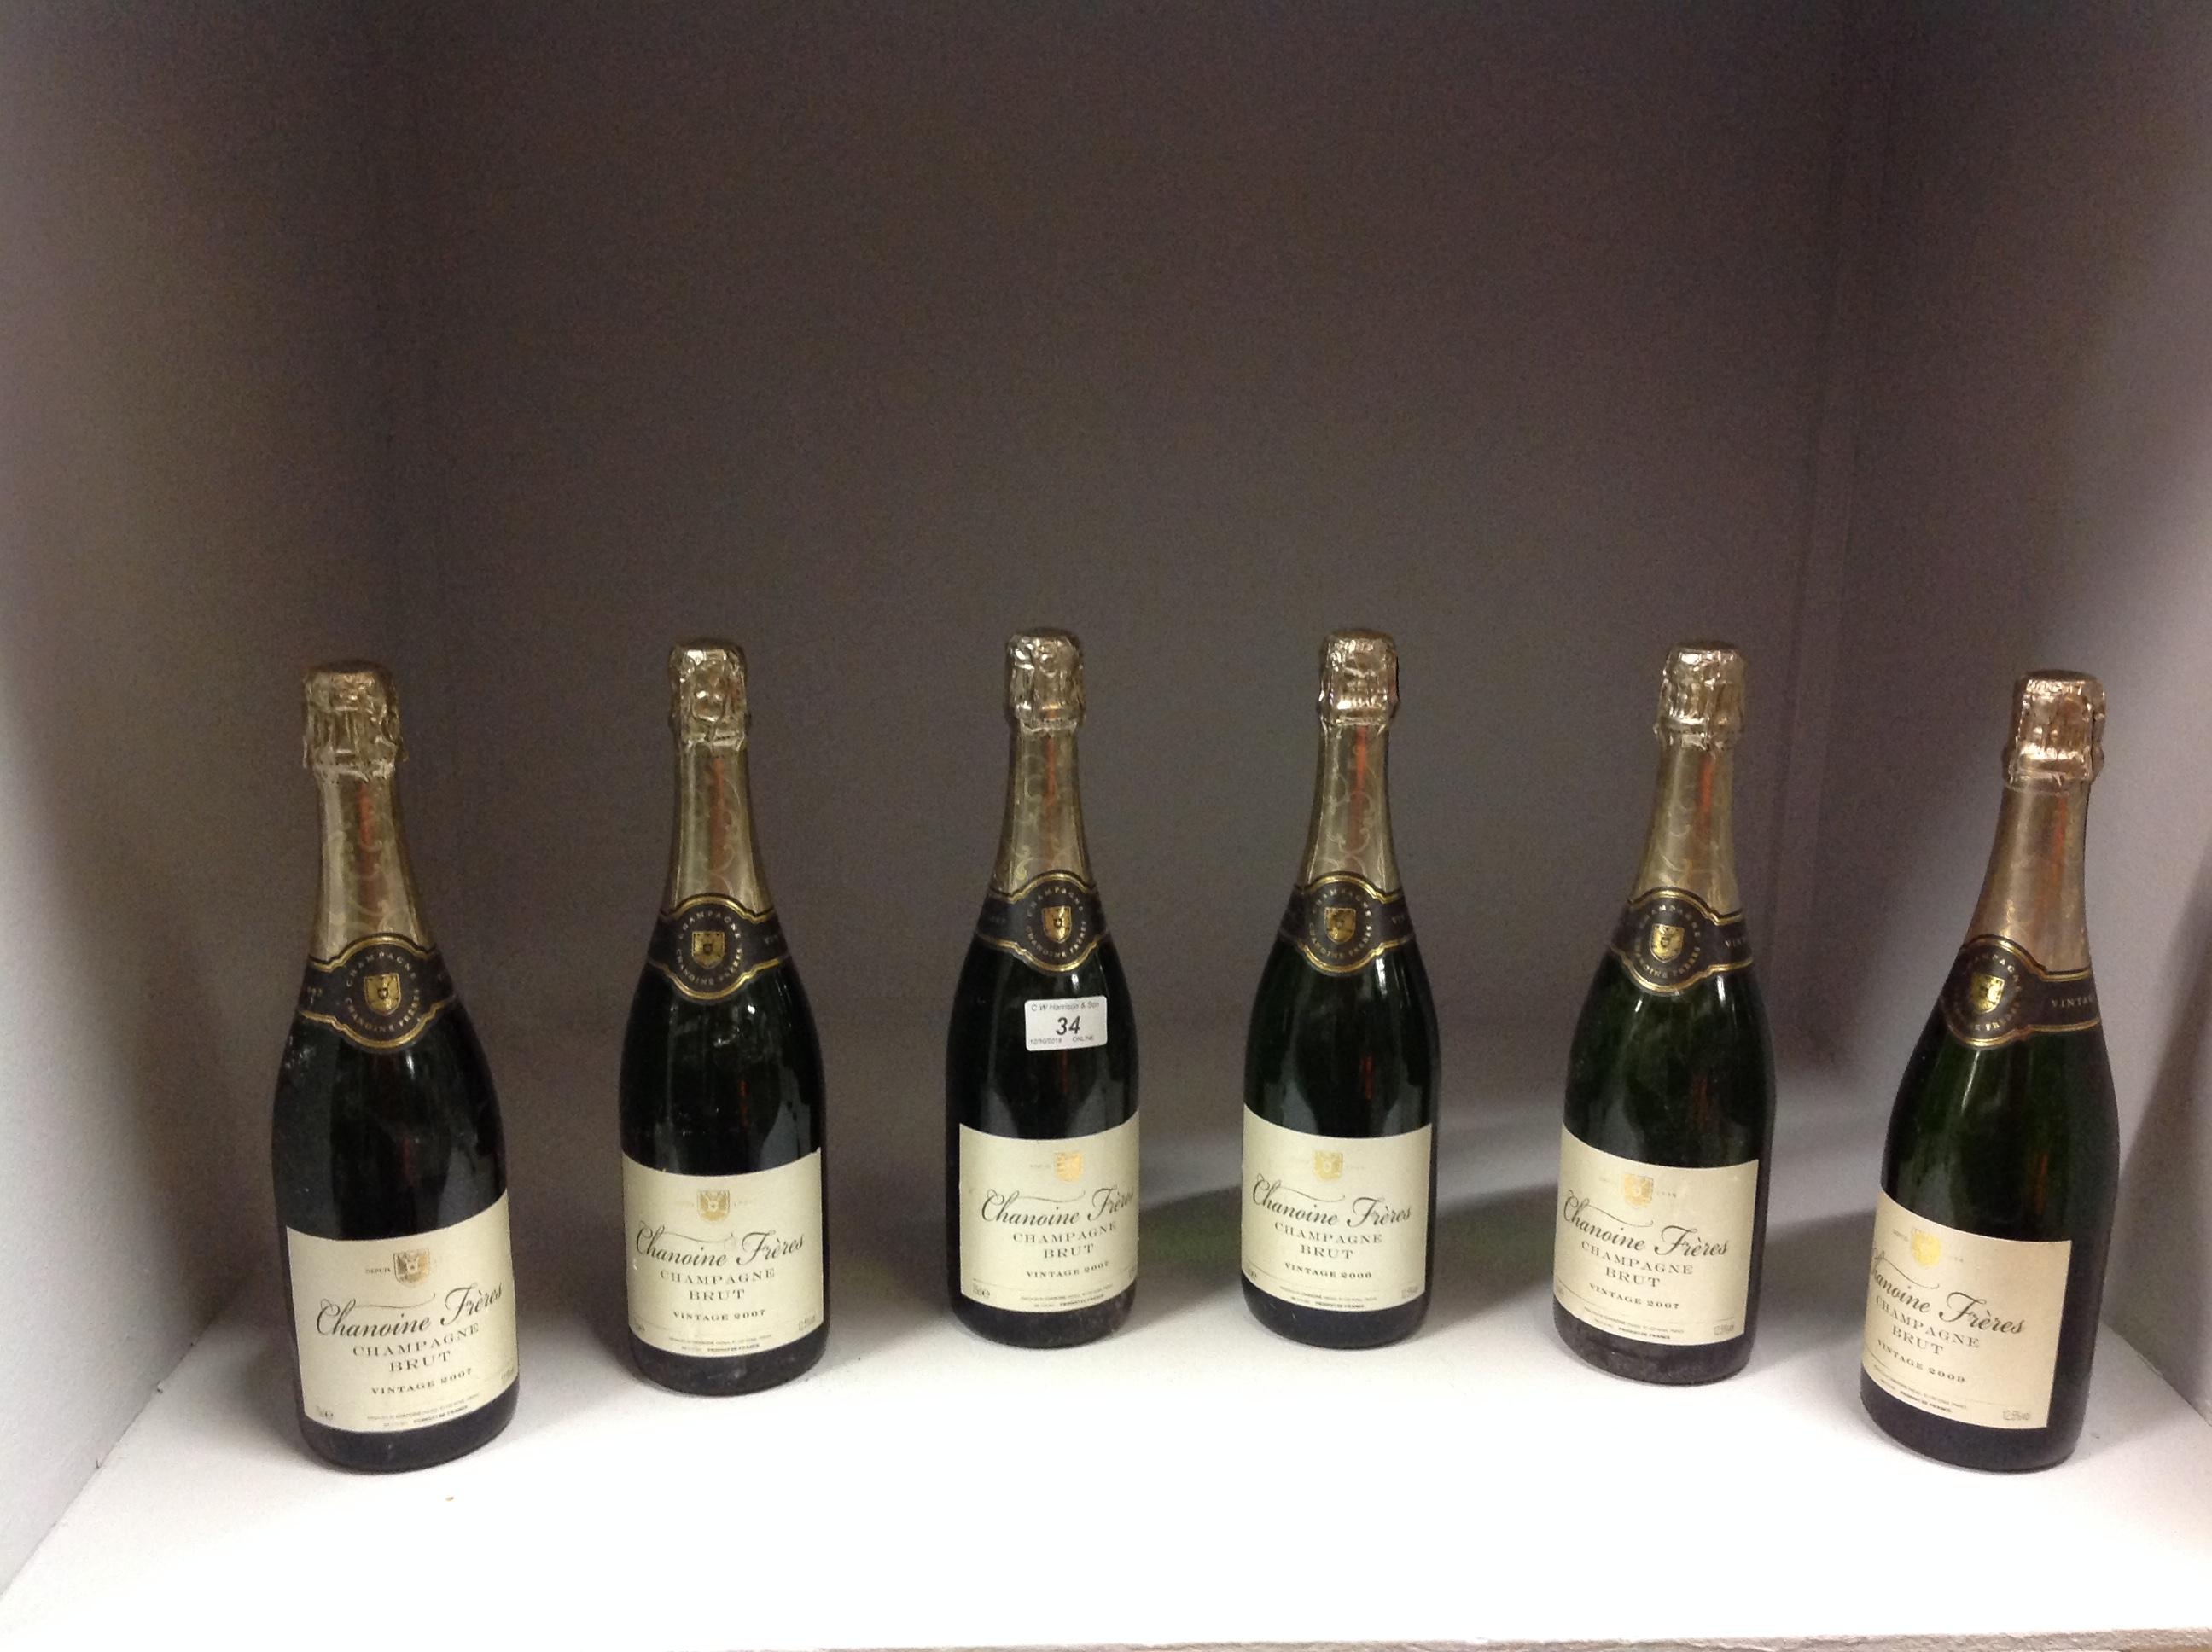 6 x 75cl bottles Chanoine Freres Champga - Image 2 of 2